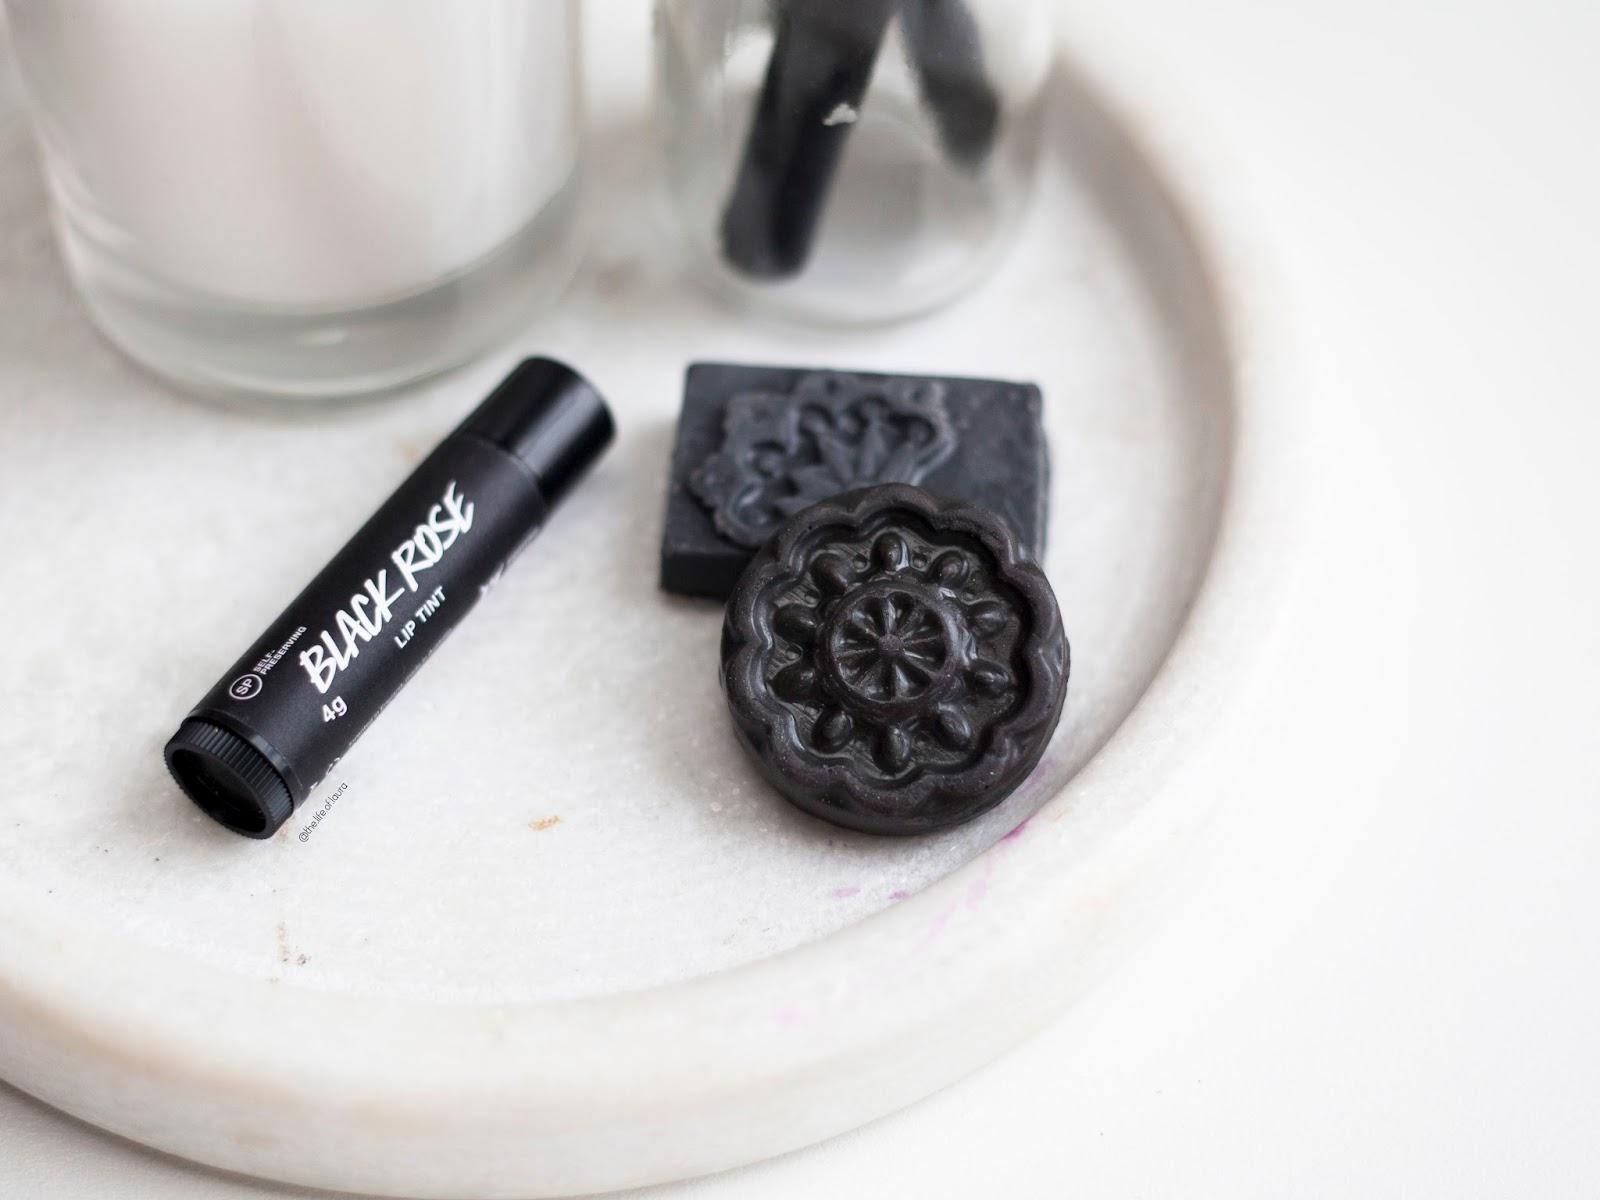 Lush Halloween Black Rose Lip Tint